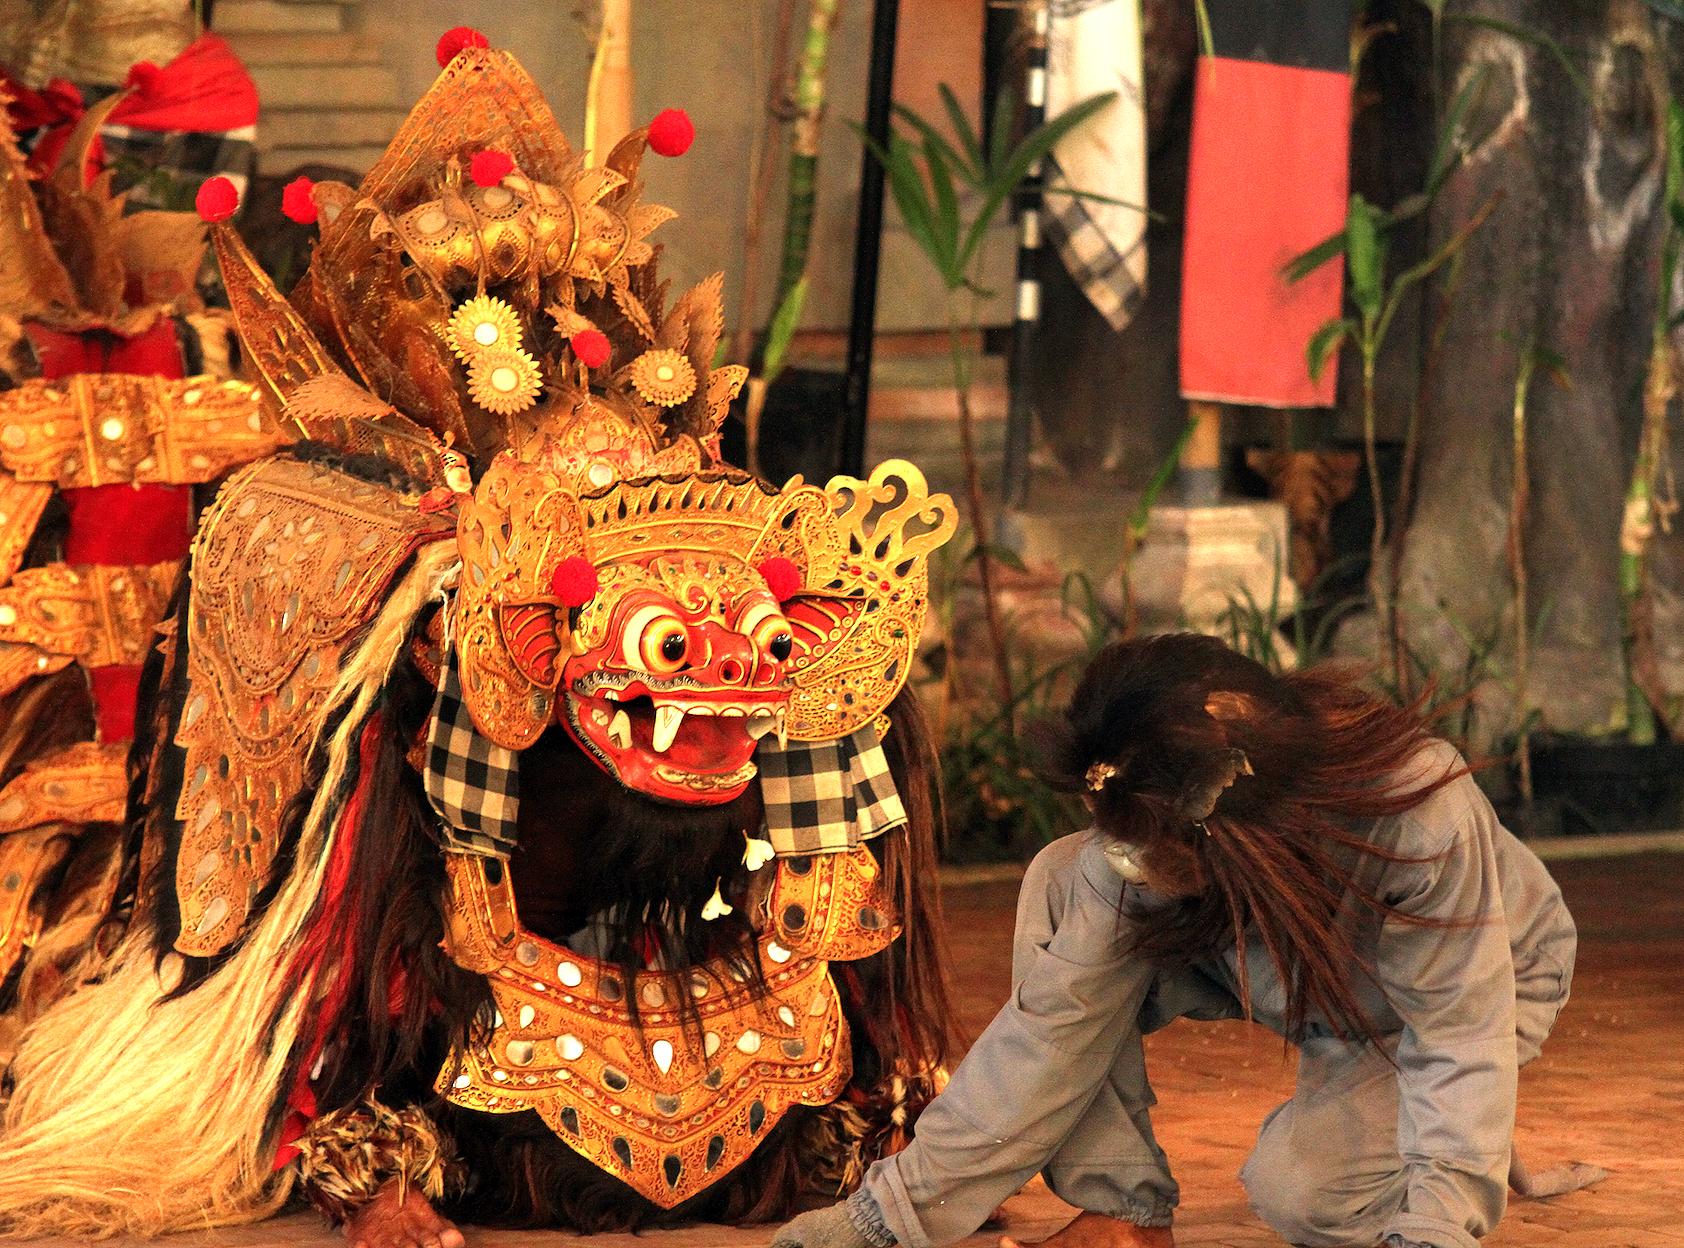 I Denpasar overvar vi et timelangt show med hvordan den gode Barongen bekjempet den onde Rangda.